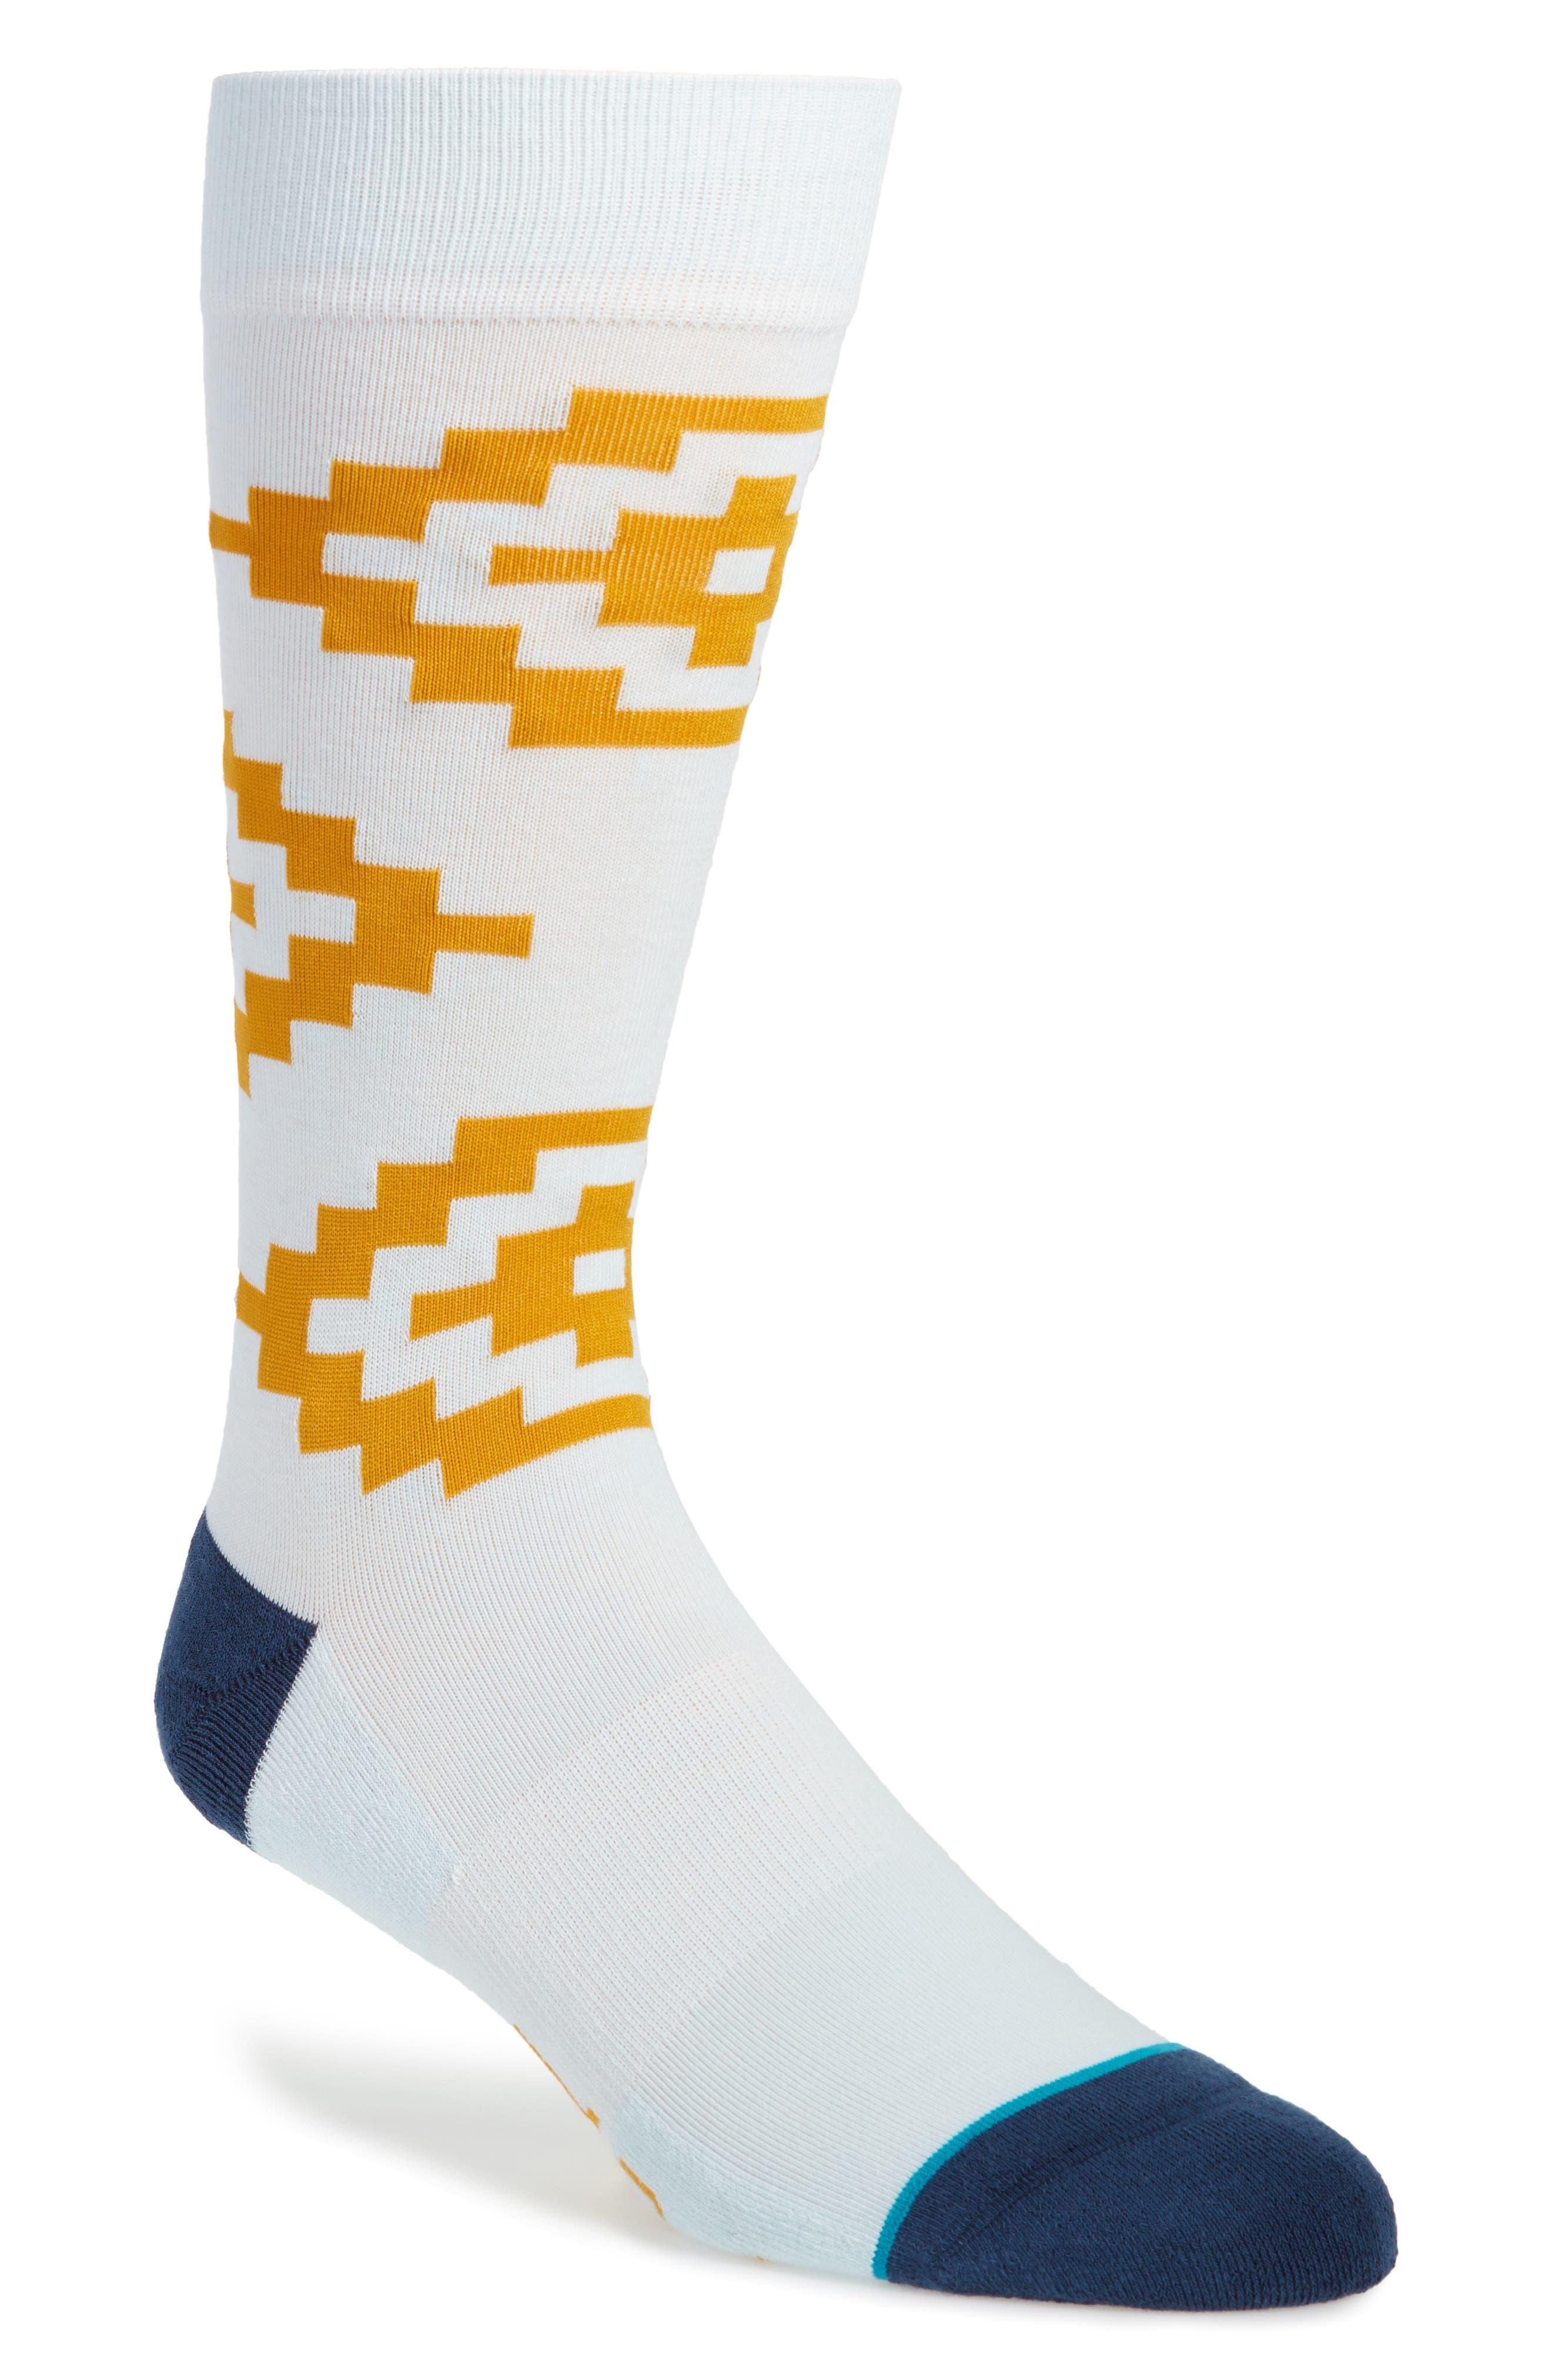 Cairns Crew Socks,                             Main thumbnail 1, color,                             420